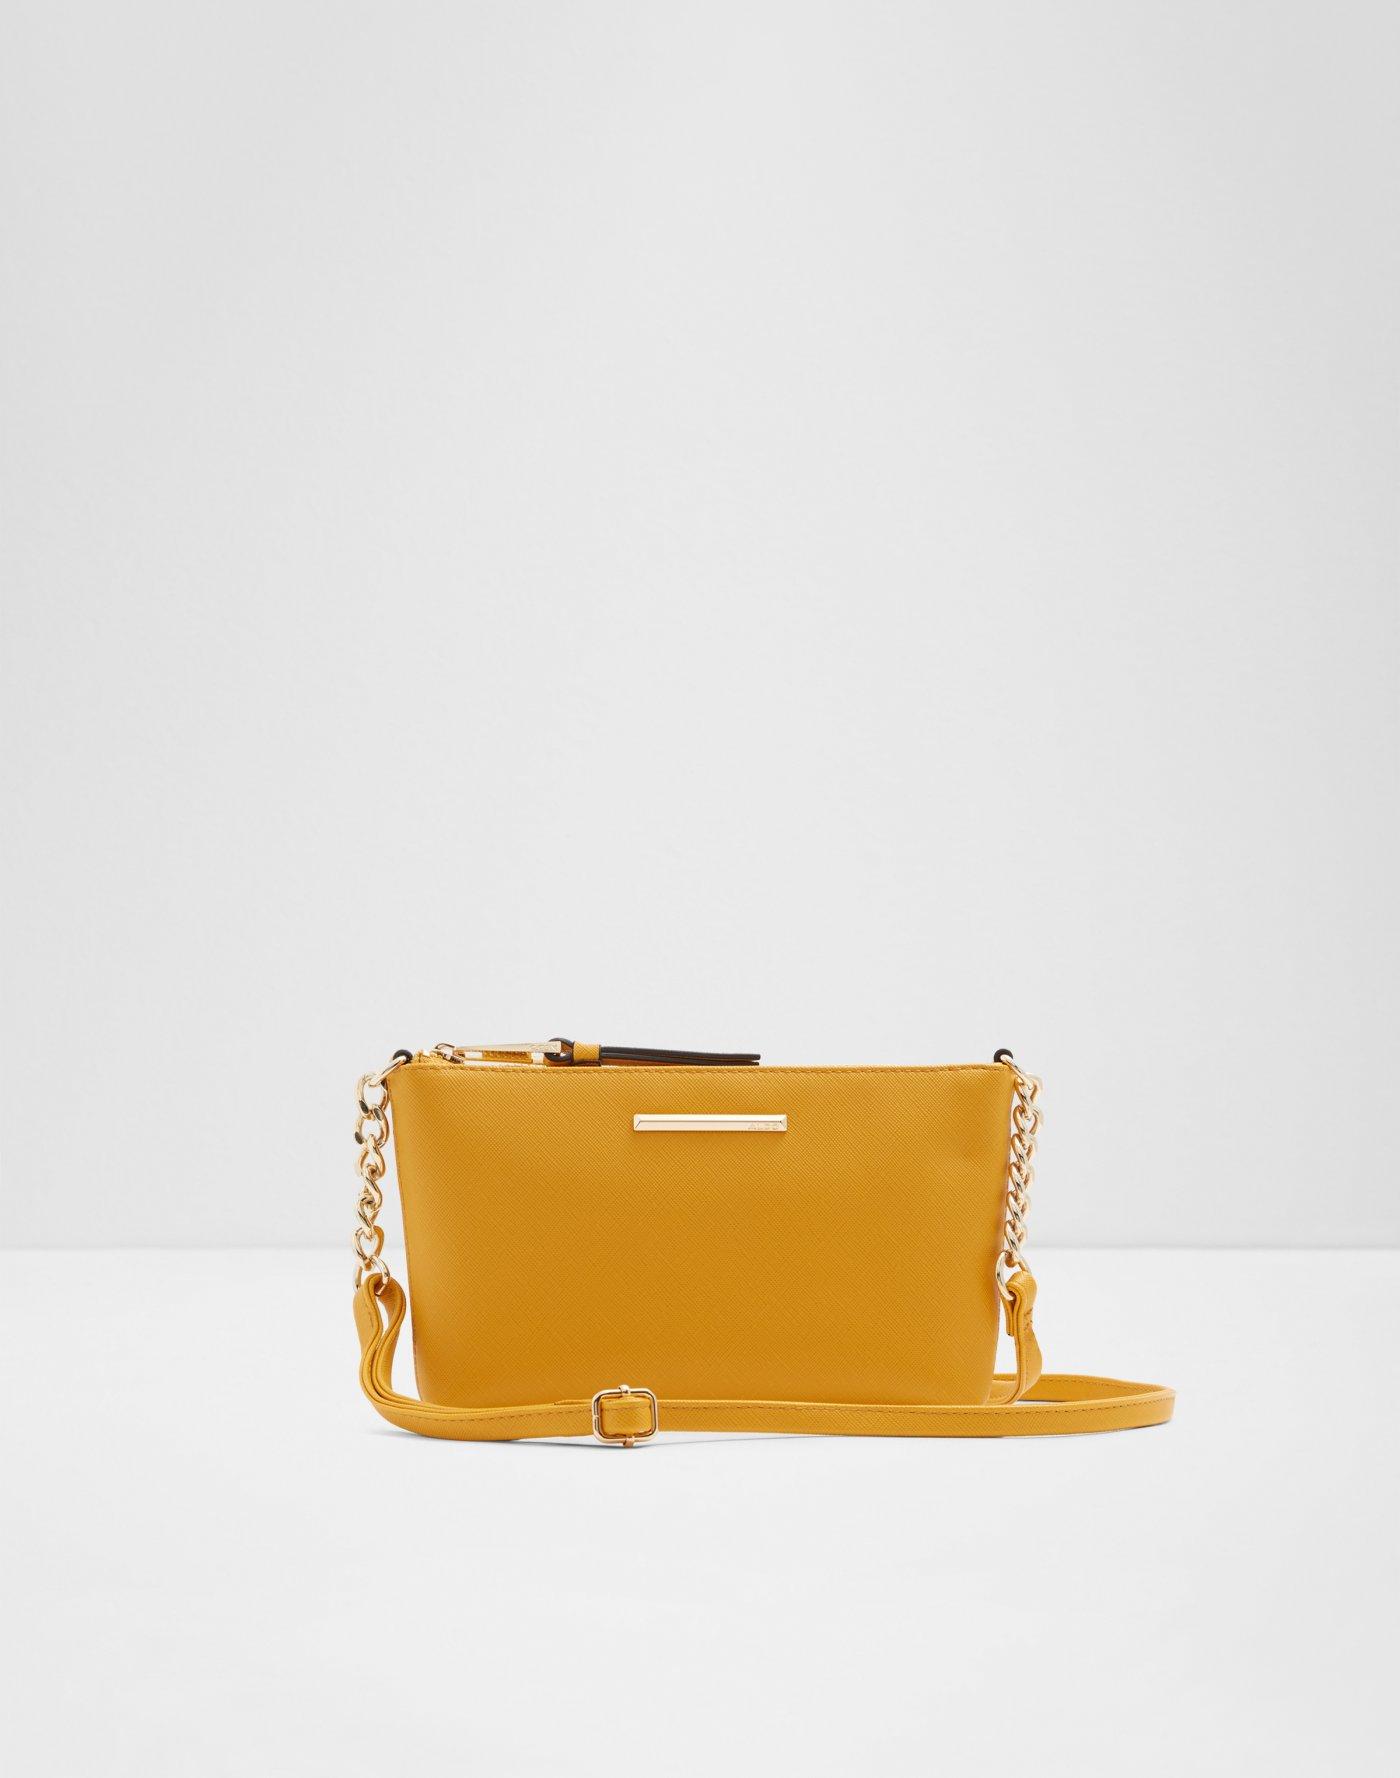 c3a6eef5f Crossbody Bags For Women | ALDO Canada | ALDO Canada